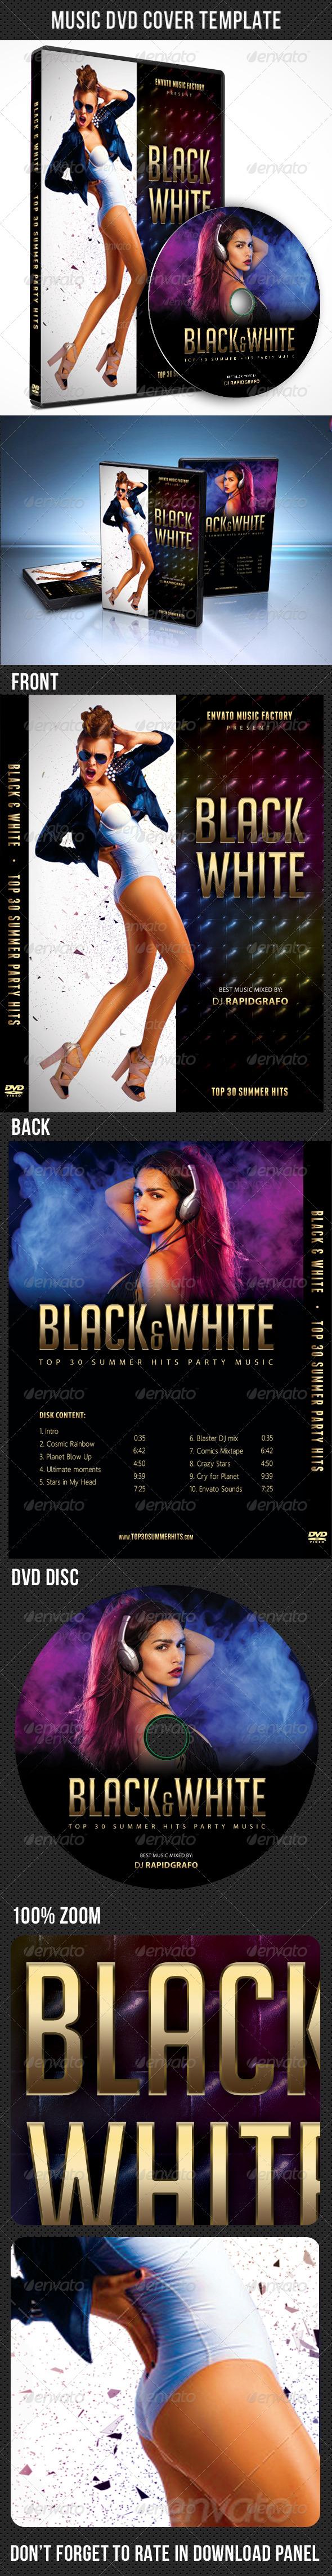 GraphicRiver Music DVD Cover Template V05 7928709